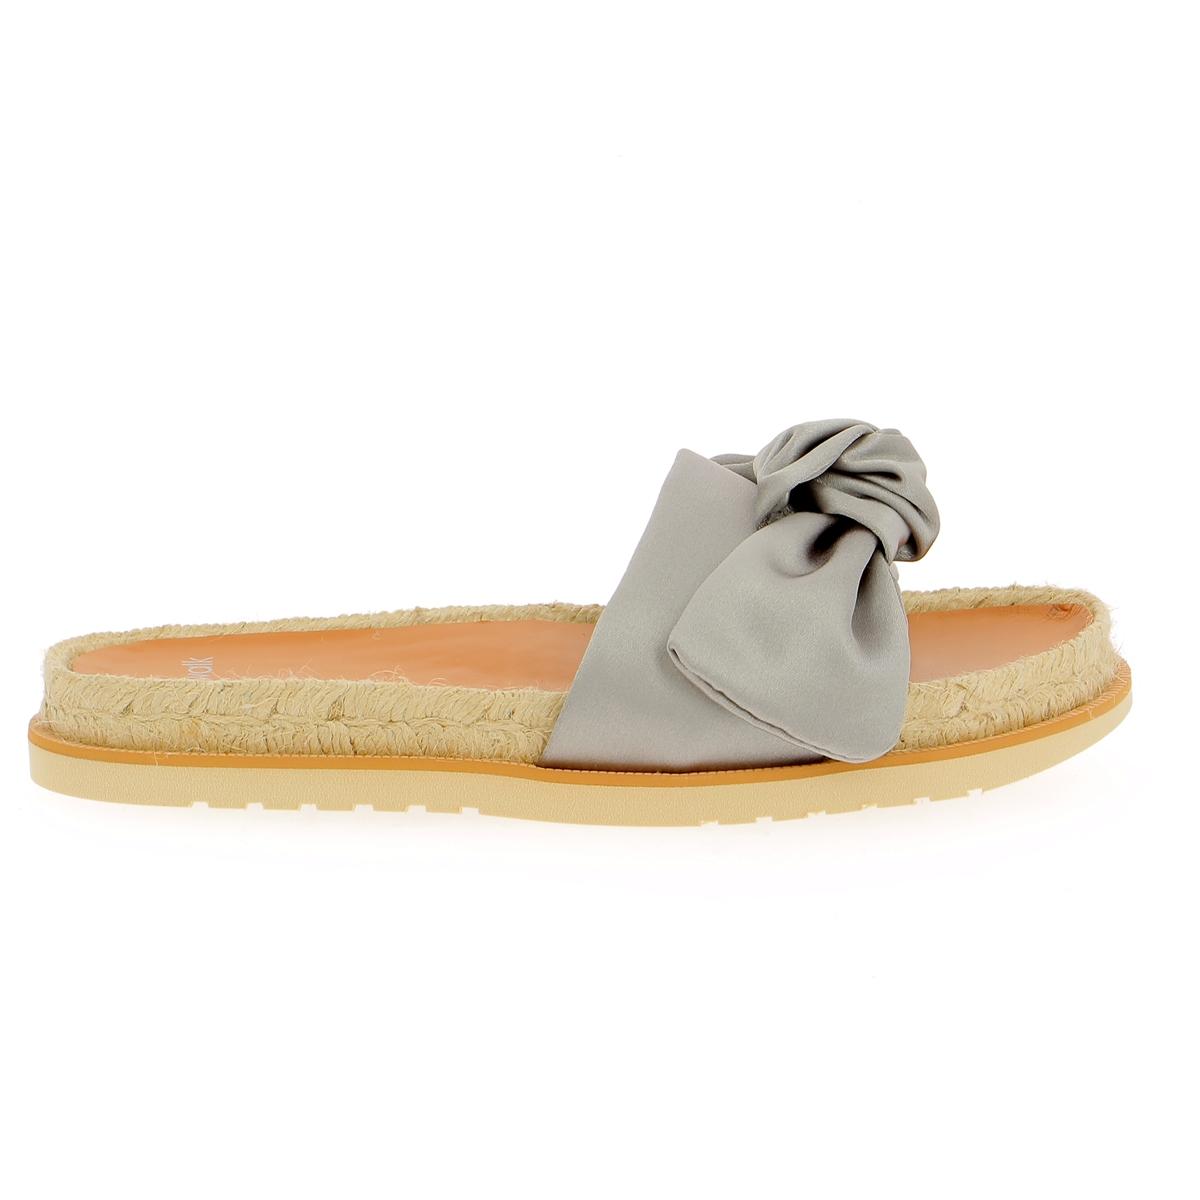 Catwalk Muiltjes - slippers zilver